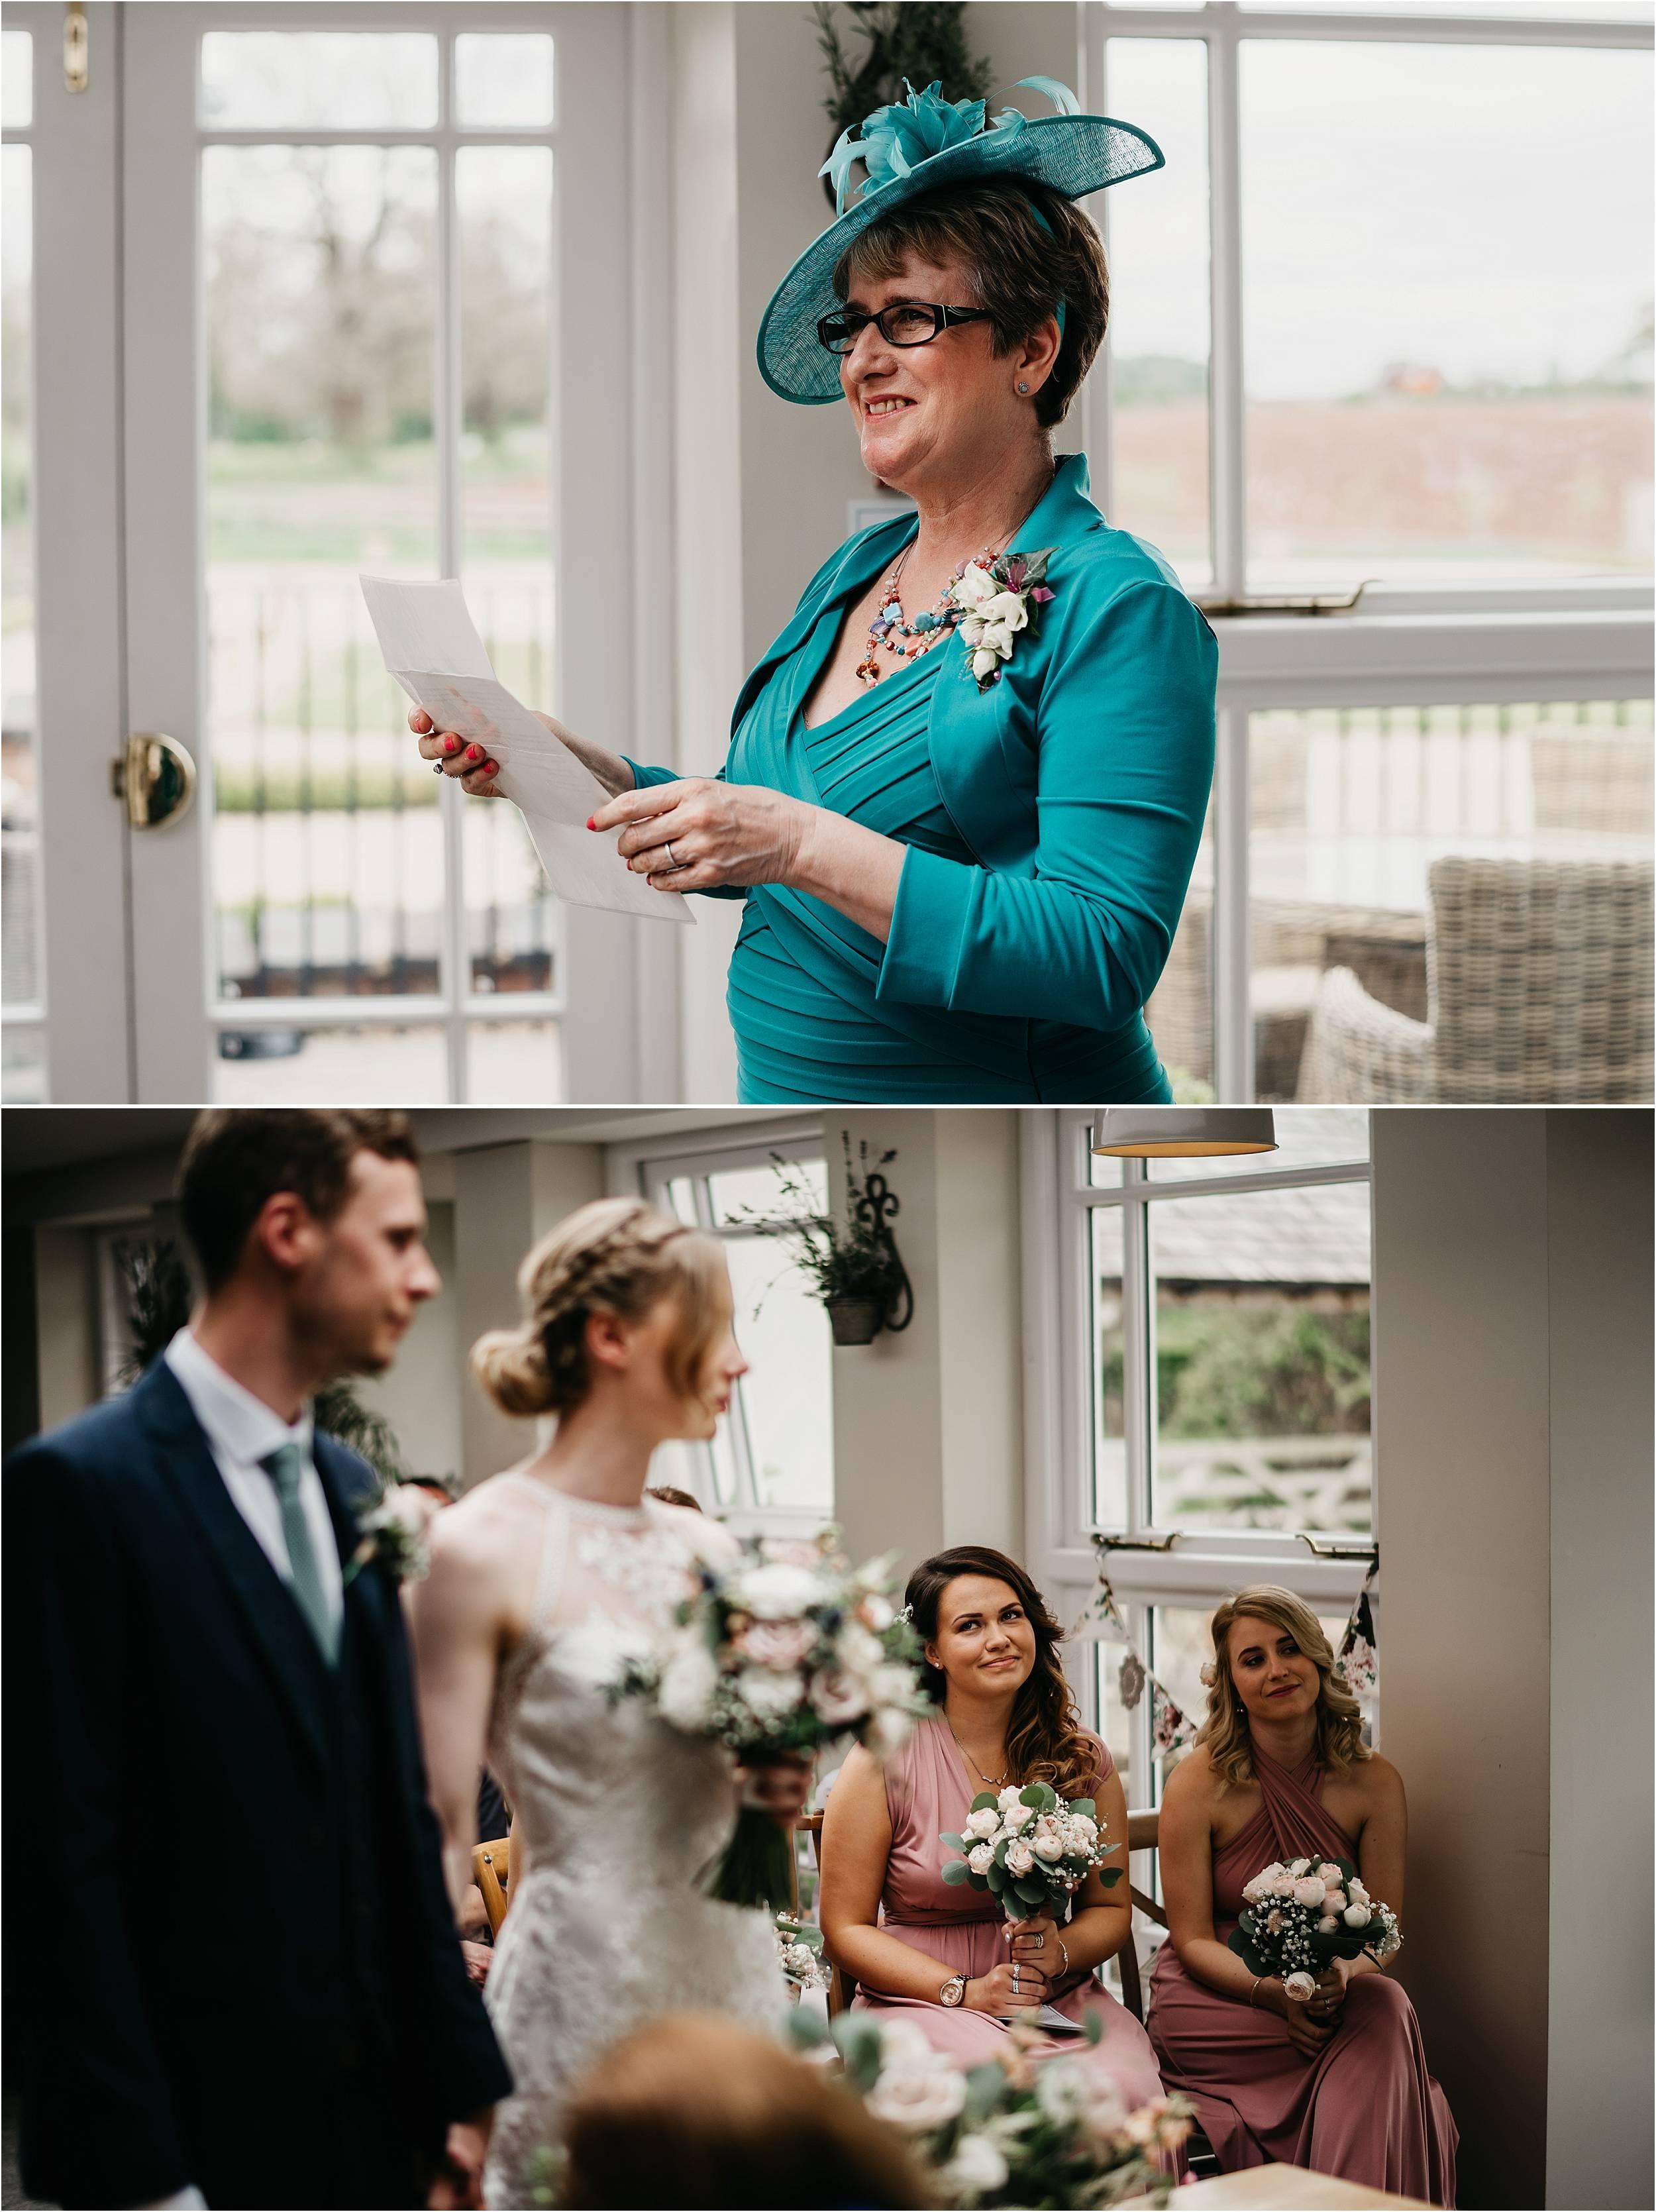 Kedleston Country House Wedding Photography_0048.jpg